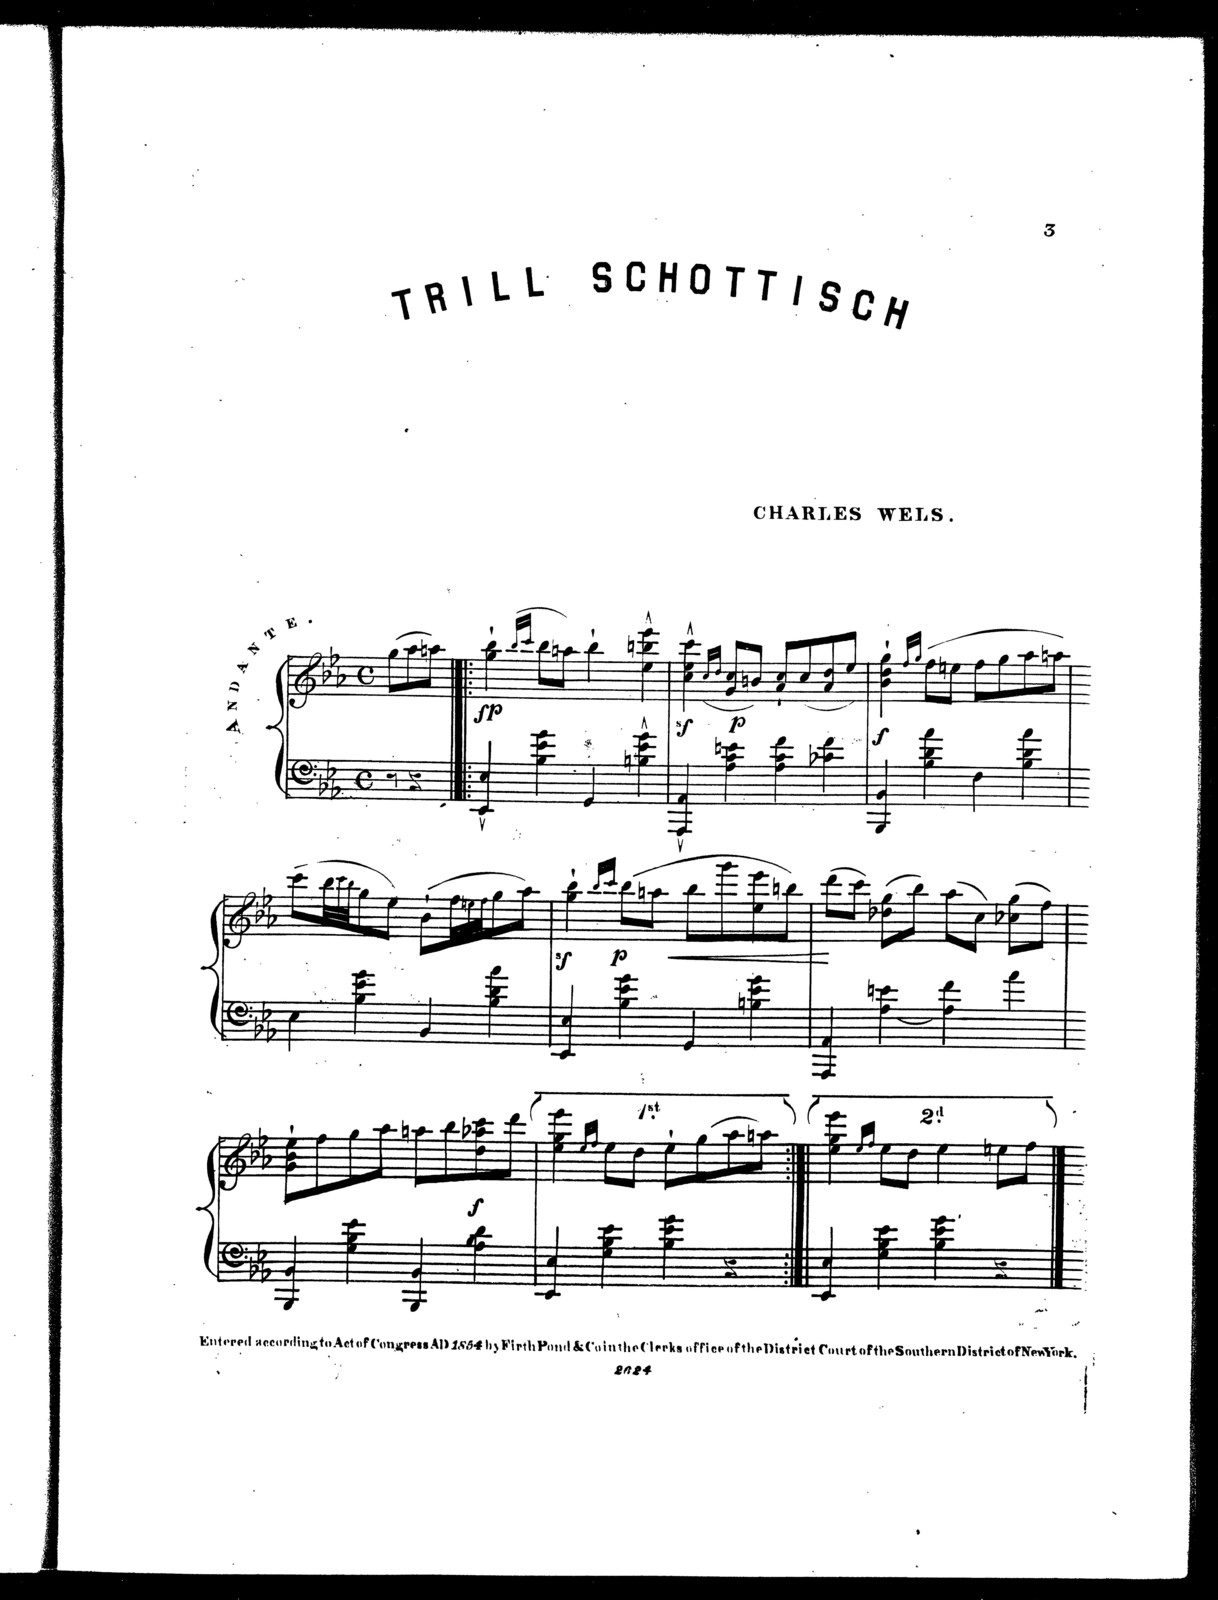 The trill schottisch - PICRYL Public Domain Image